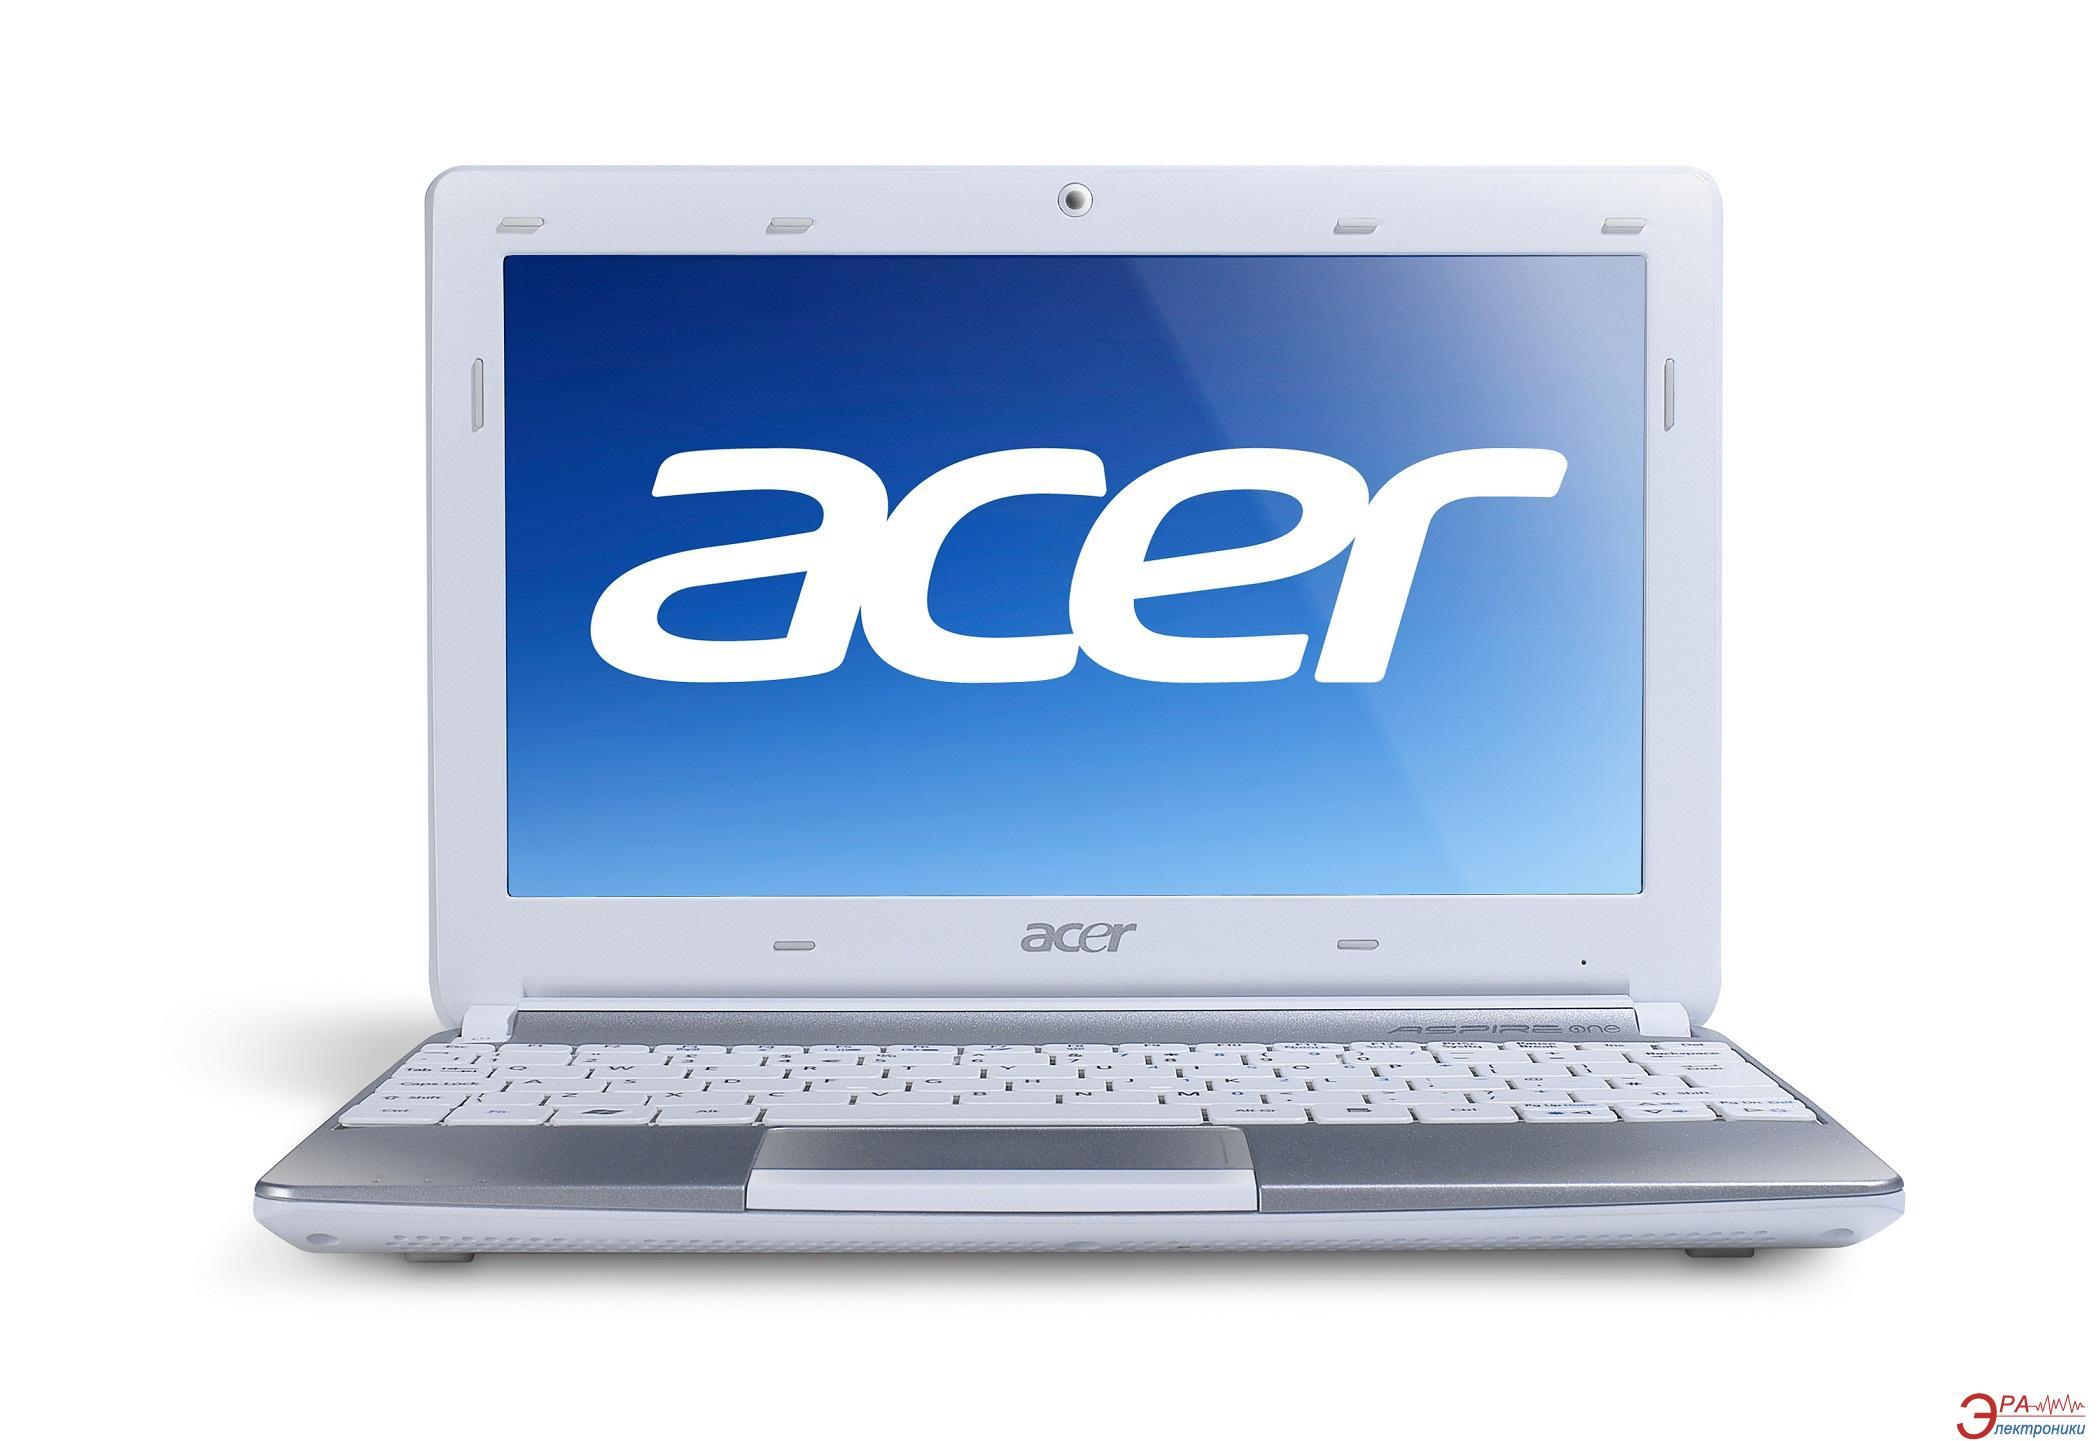 Нетбук Acer Aspire One D257-N57Cws (LU.SFW0C.045) White 10.1